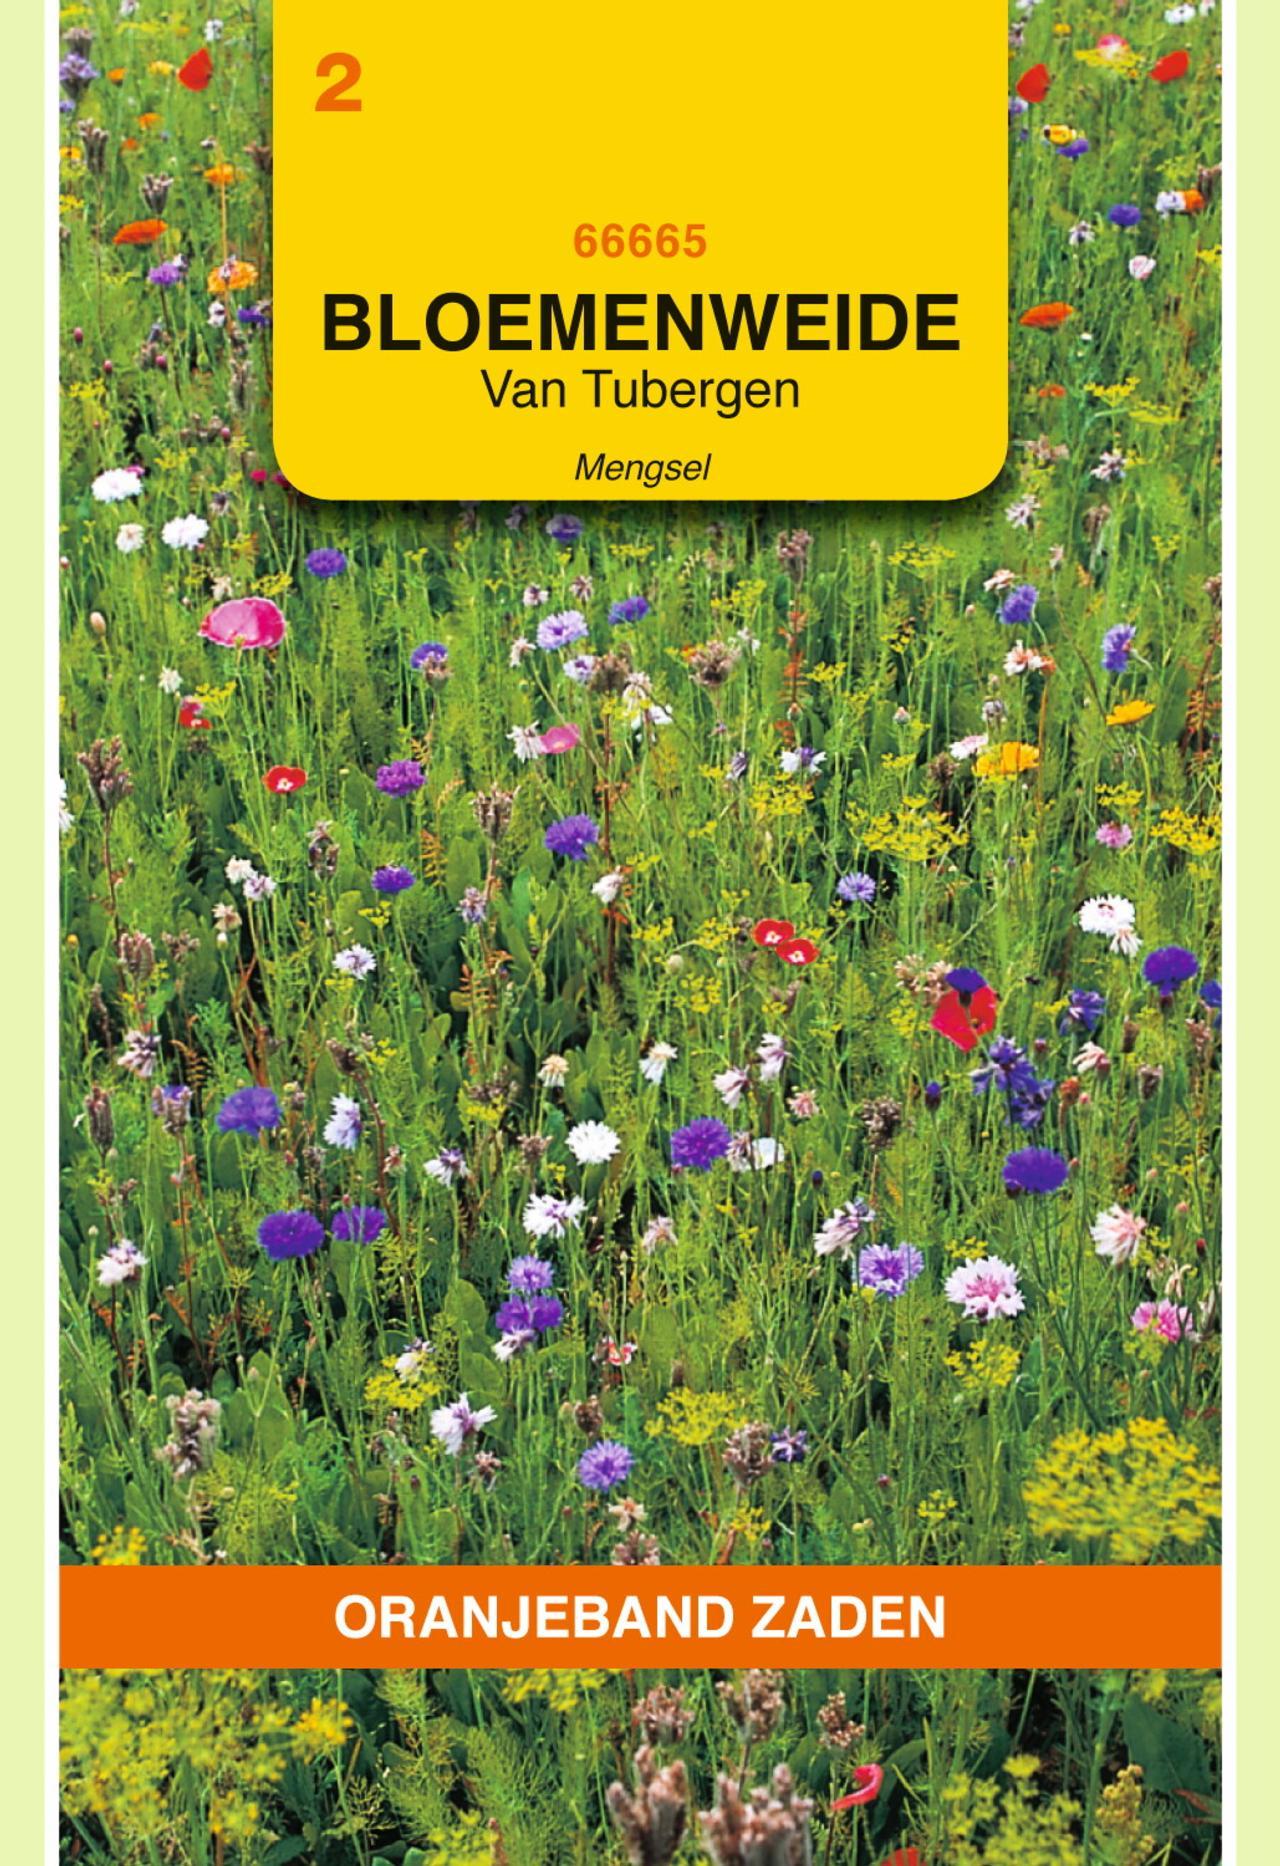 Van Tubergen bloemenweide mengsel plant